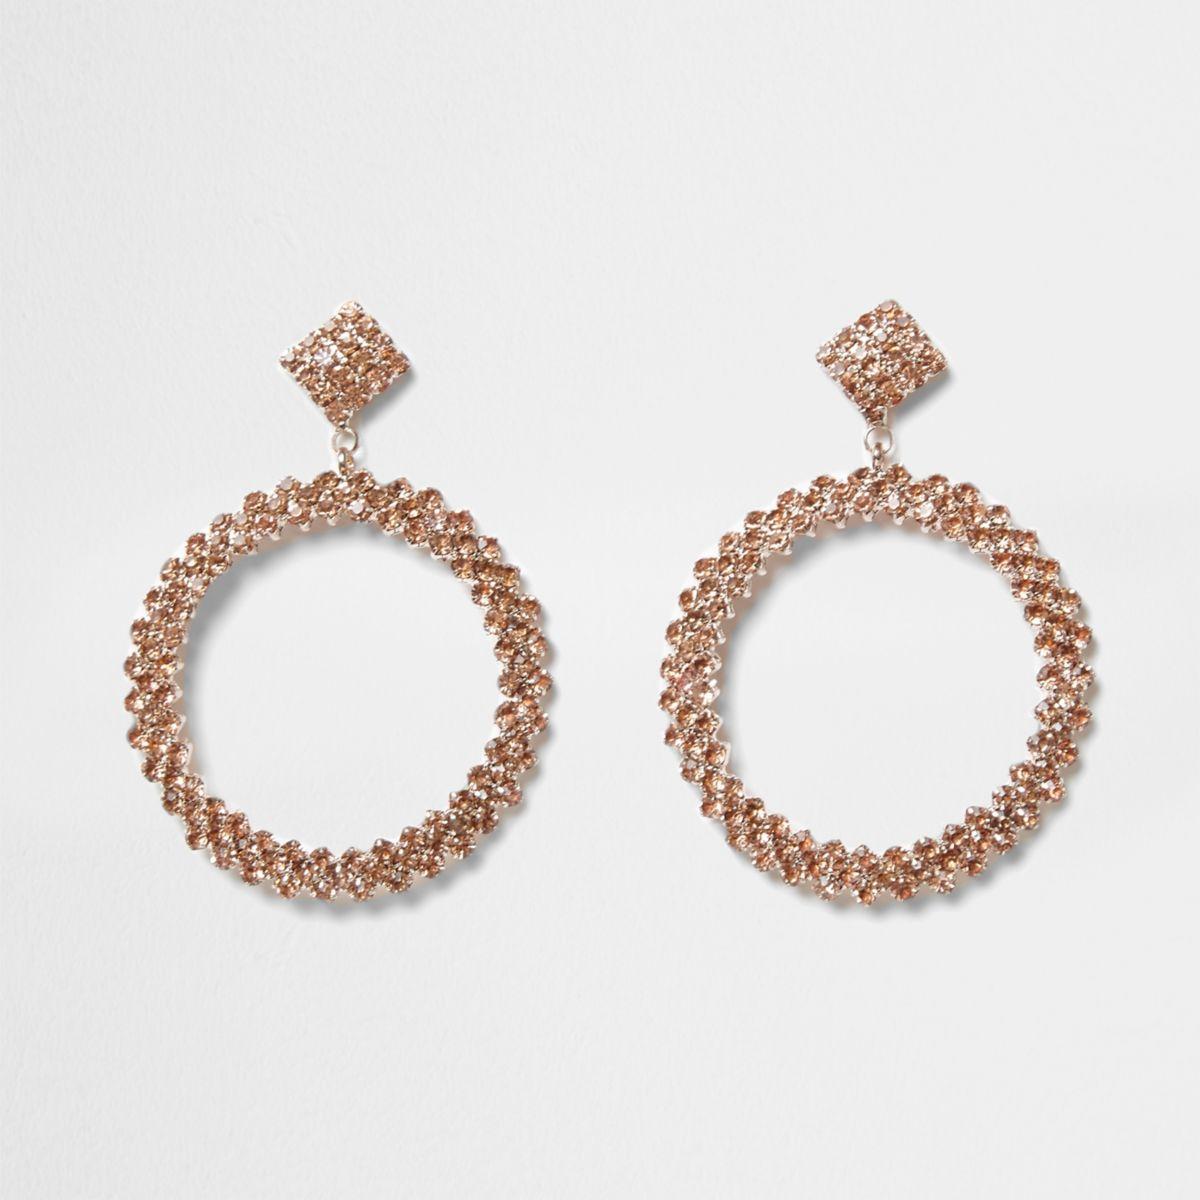 Rose gold tone diamante hoop drop earrings